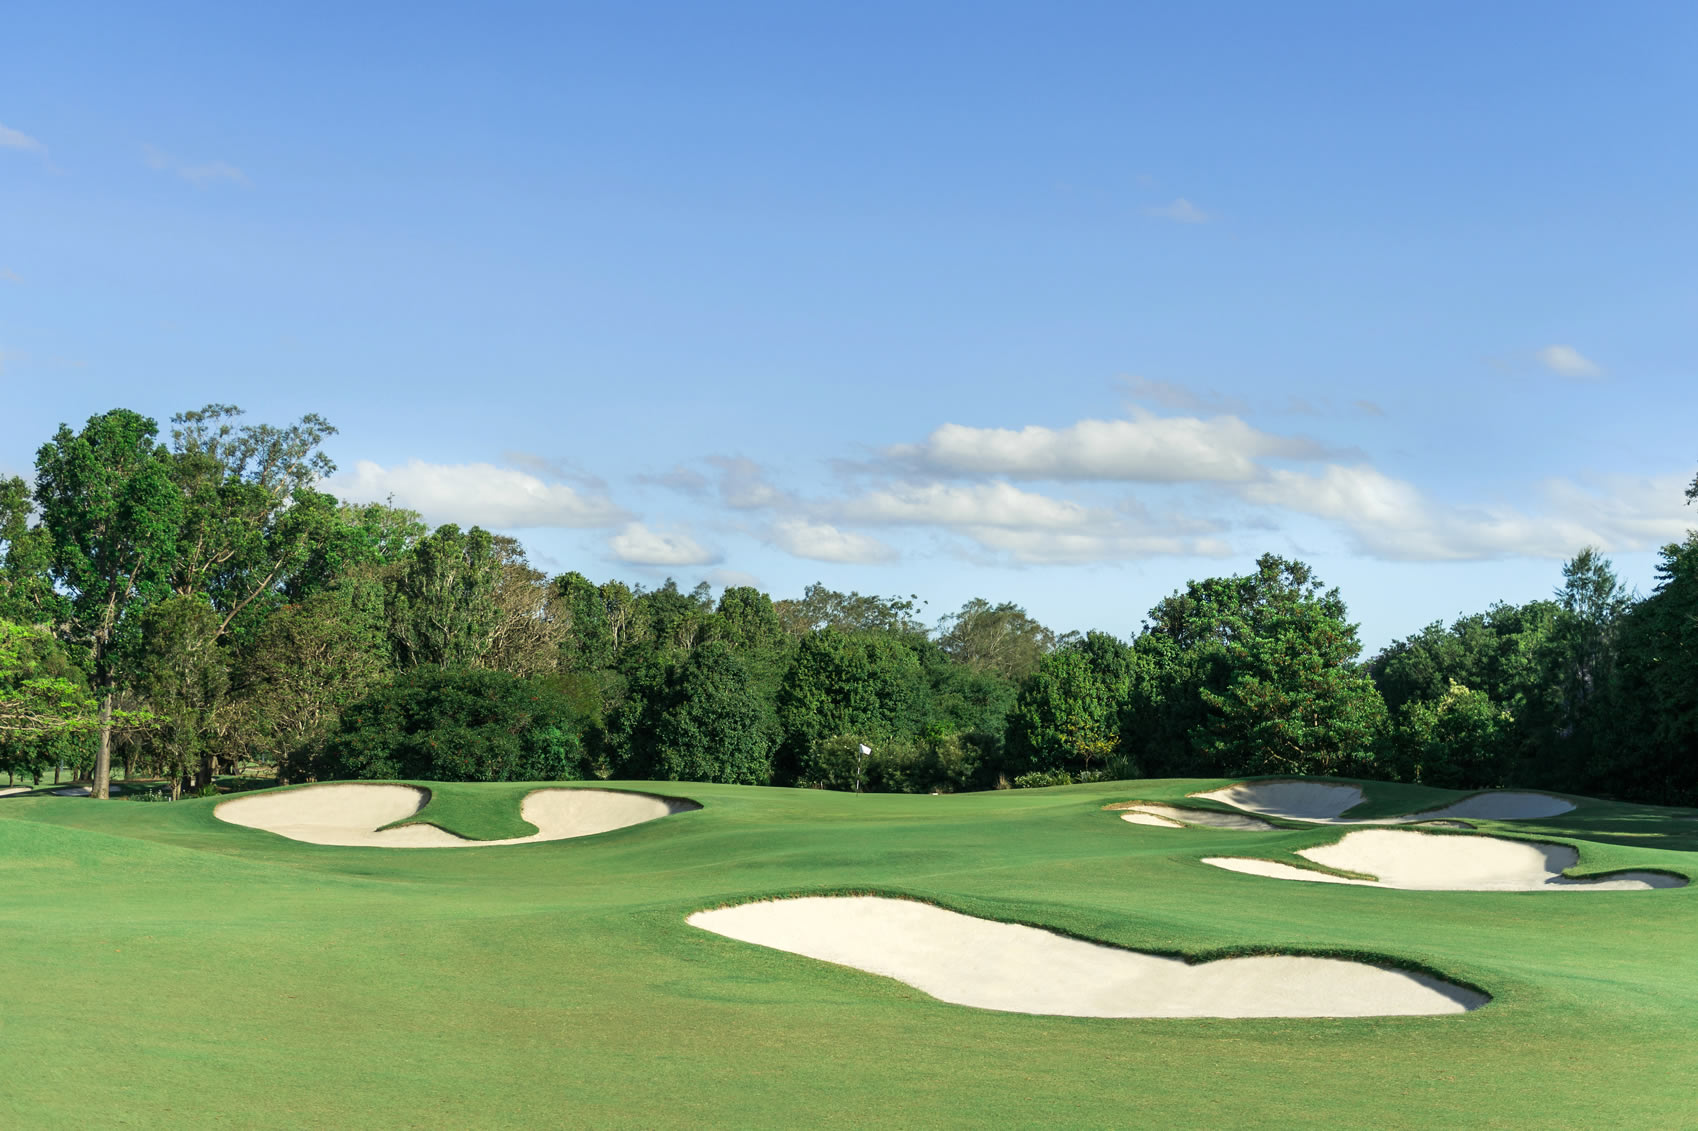 Home - Indooroopilly Golf ClubIndooroopilly Golf Club